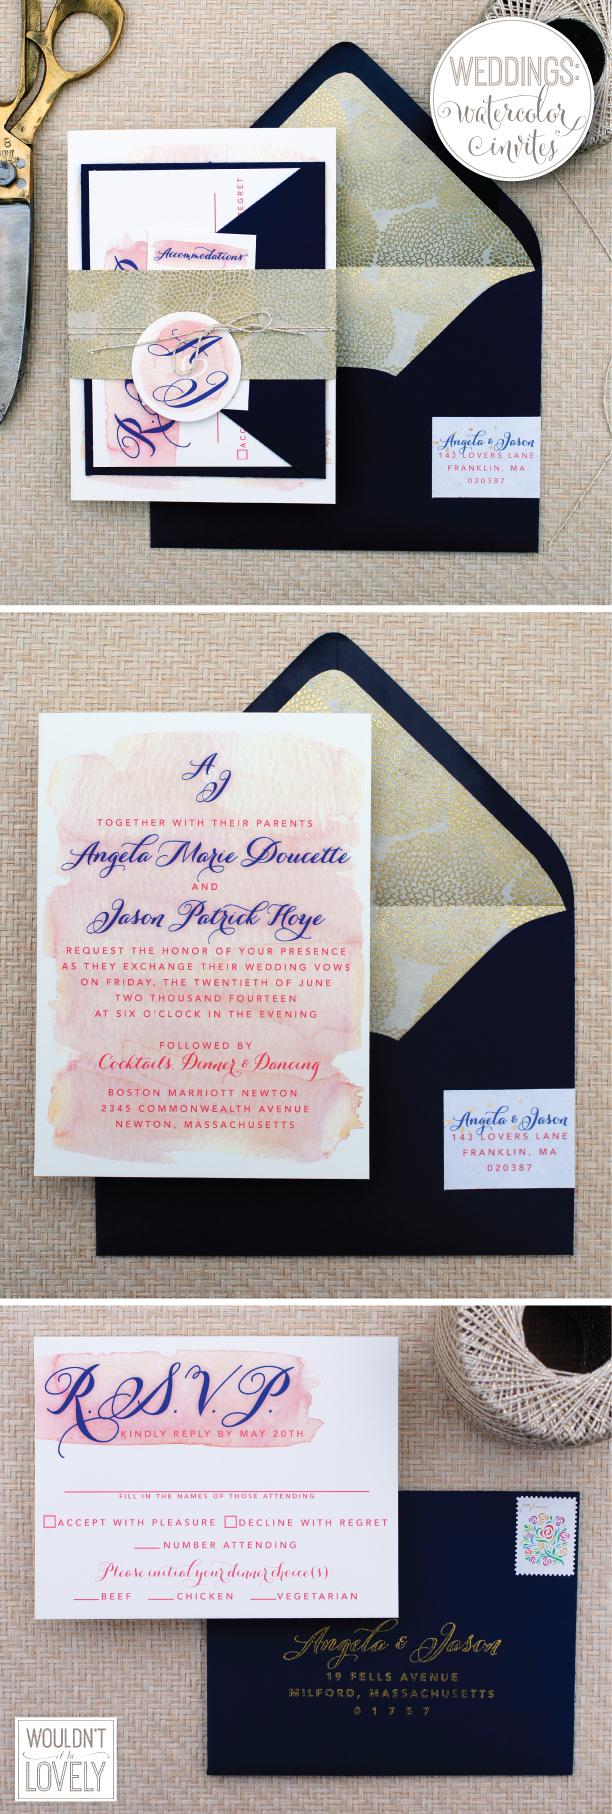 pink and navy watercolor wash wedding invites